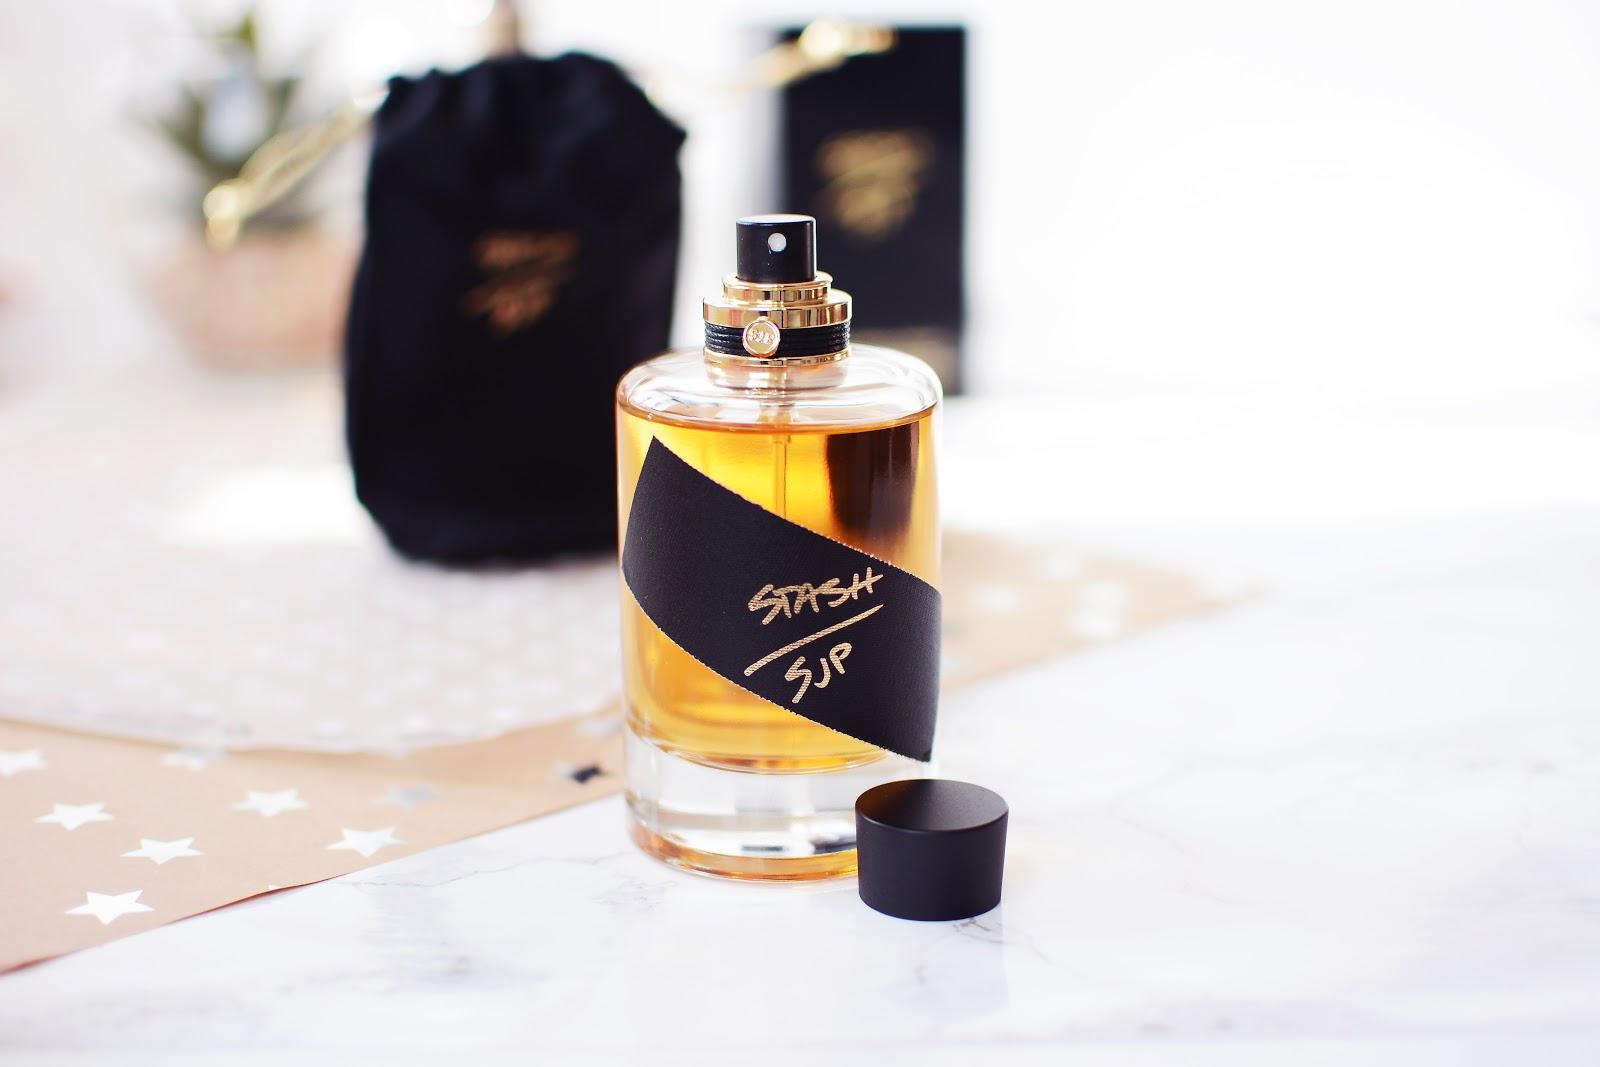 Stash by Sarah Jessica Parker | A Genderless Perfume